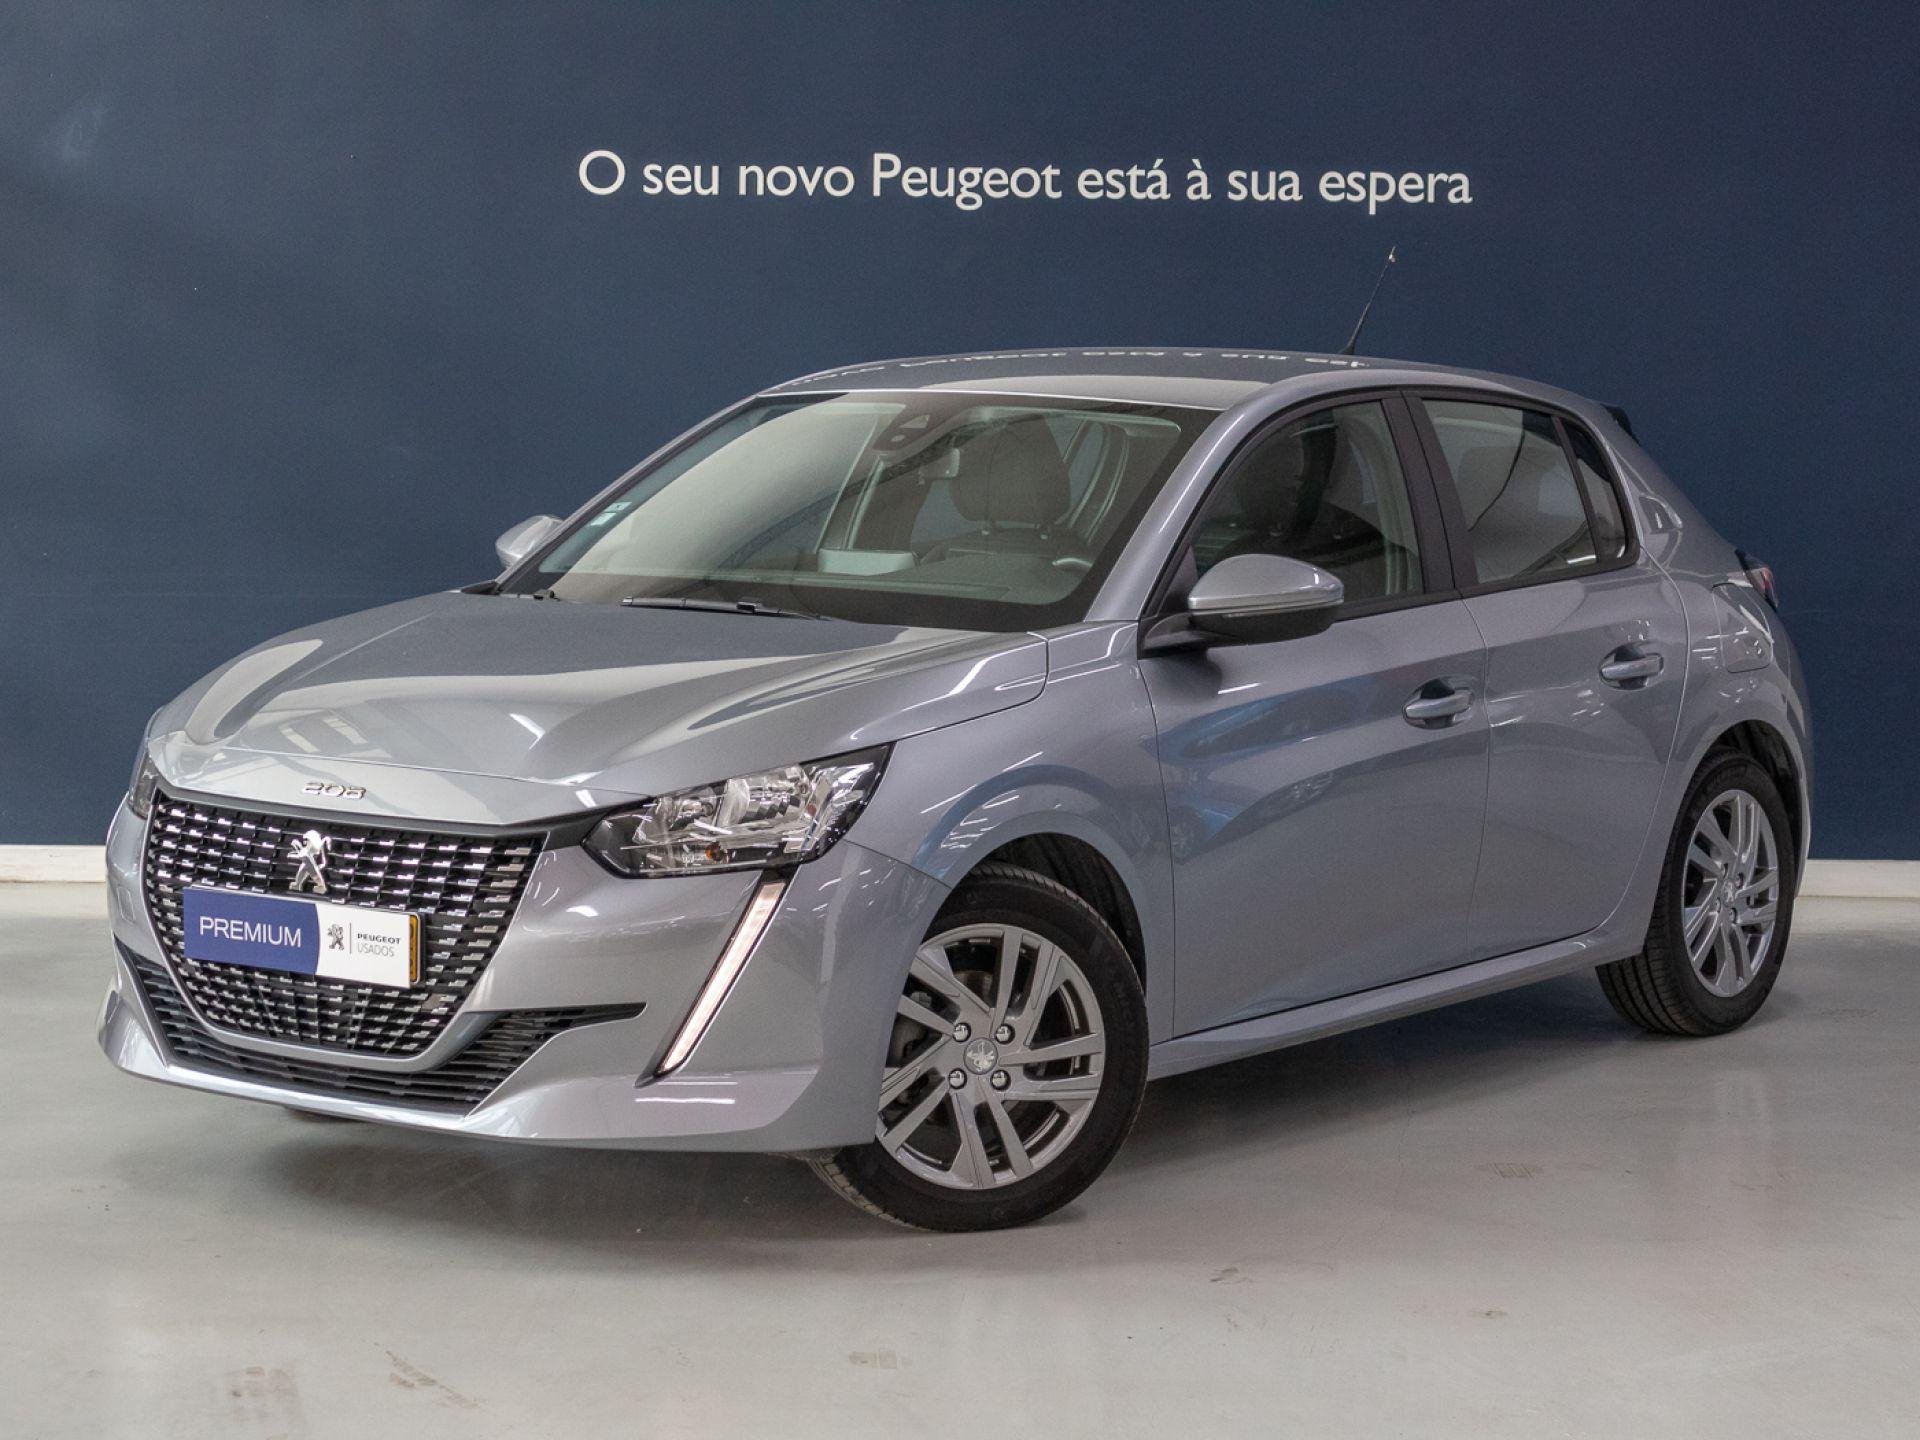 Peugeot 208 1.2 PureTech 100cv Active segunda mão Setúbal